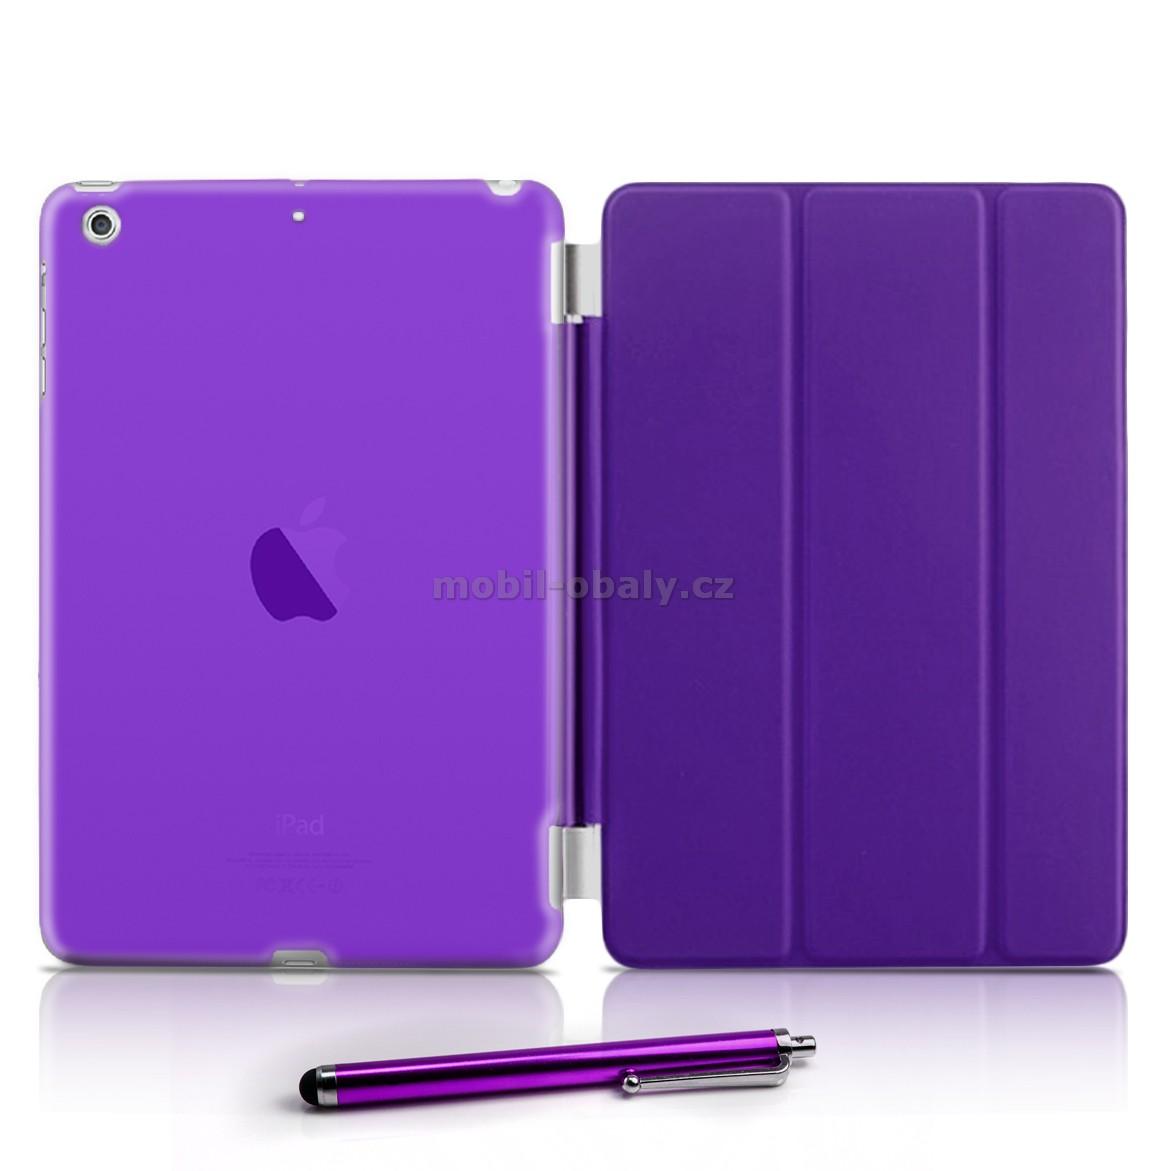 Magnetické pouzdro na tablet Apple iPad Air fialová barva + folie zdarma  empty e4d72cbc1a6